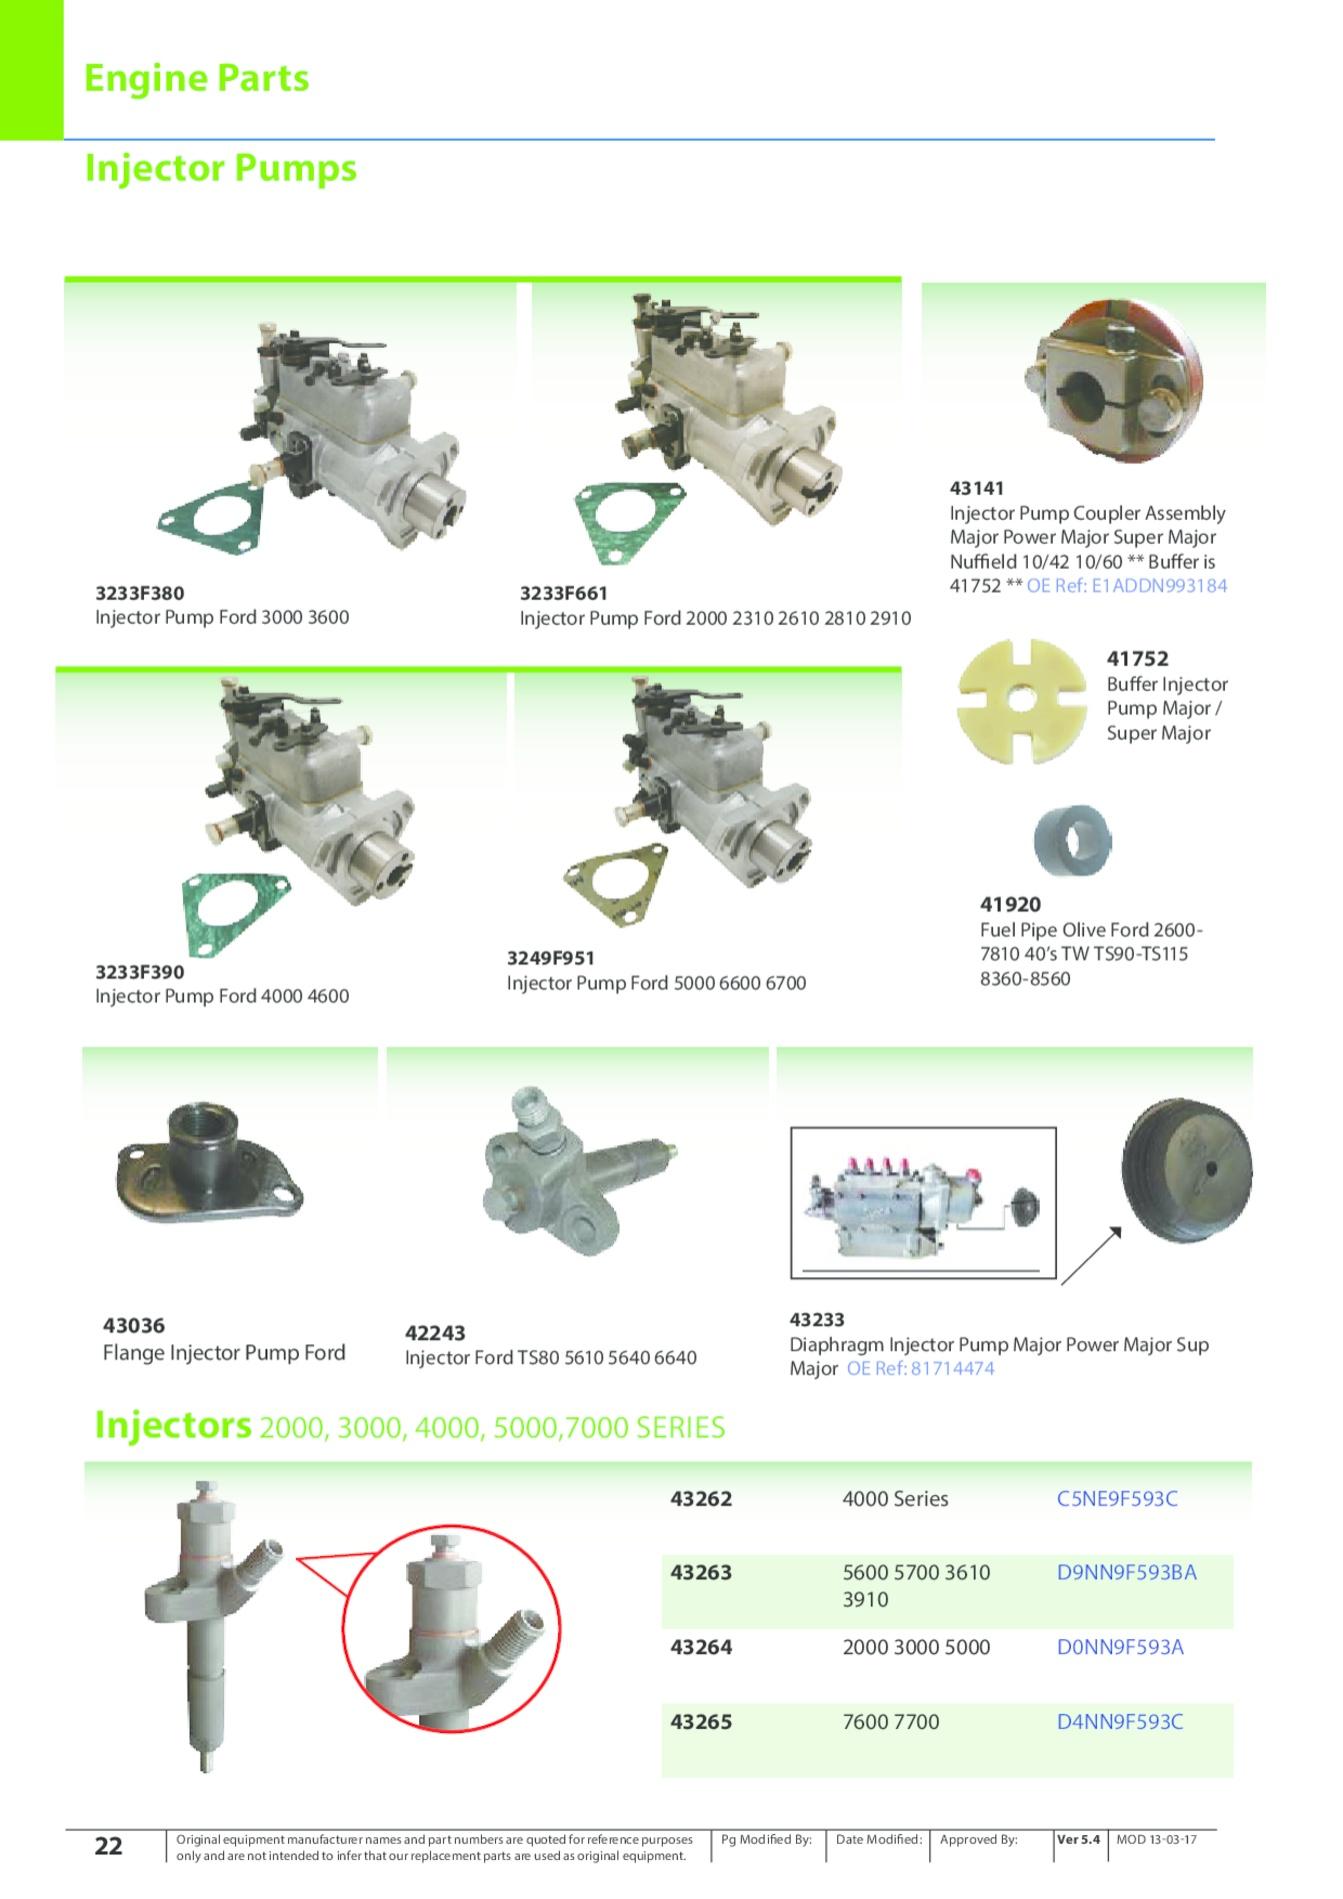 Ford 4000 Injector Pump Diagram Schematic Diagrams Cav Injection On Perkins Fuel 2600 Diy Wiring U2022 Diesel